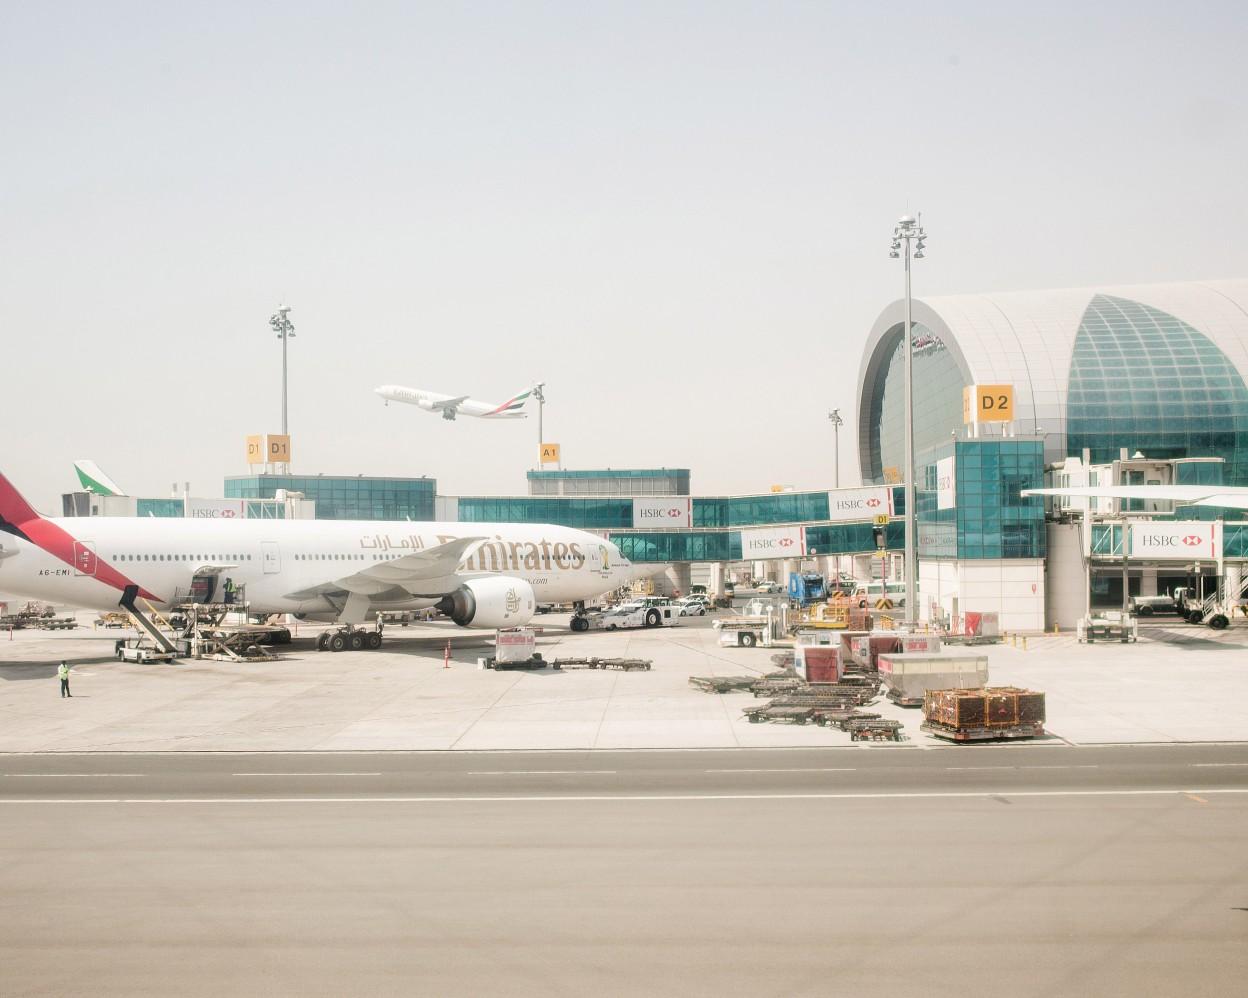 Sean-Fennessy-Dubai-International-Airport_003